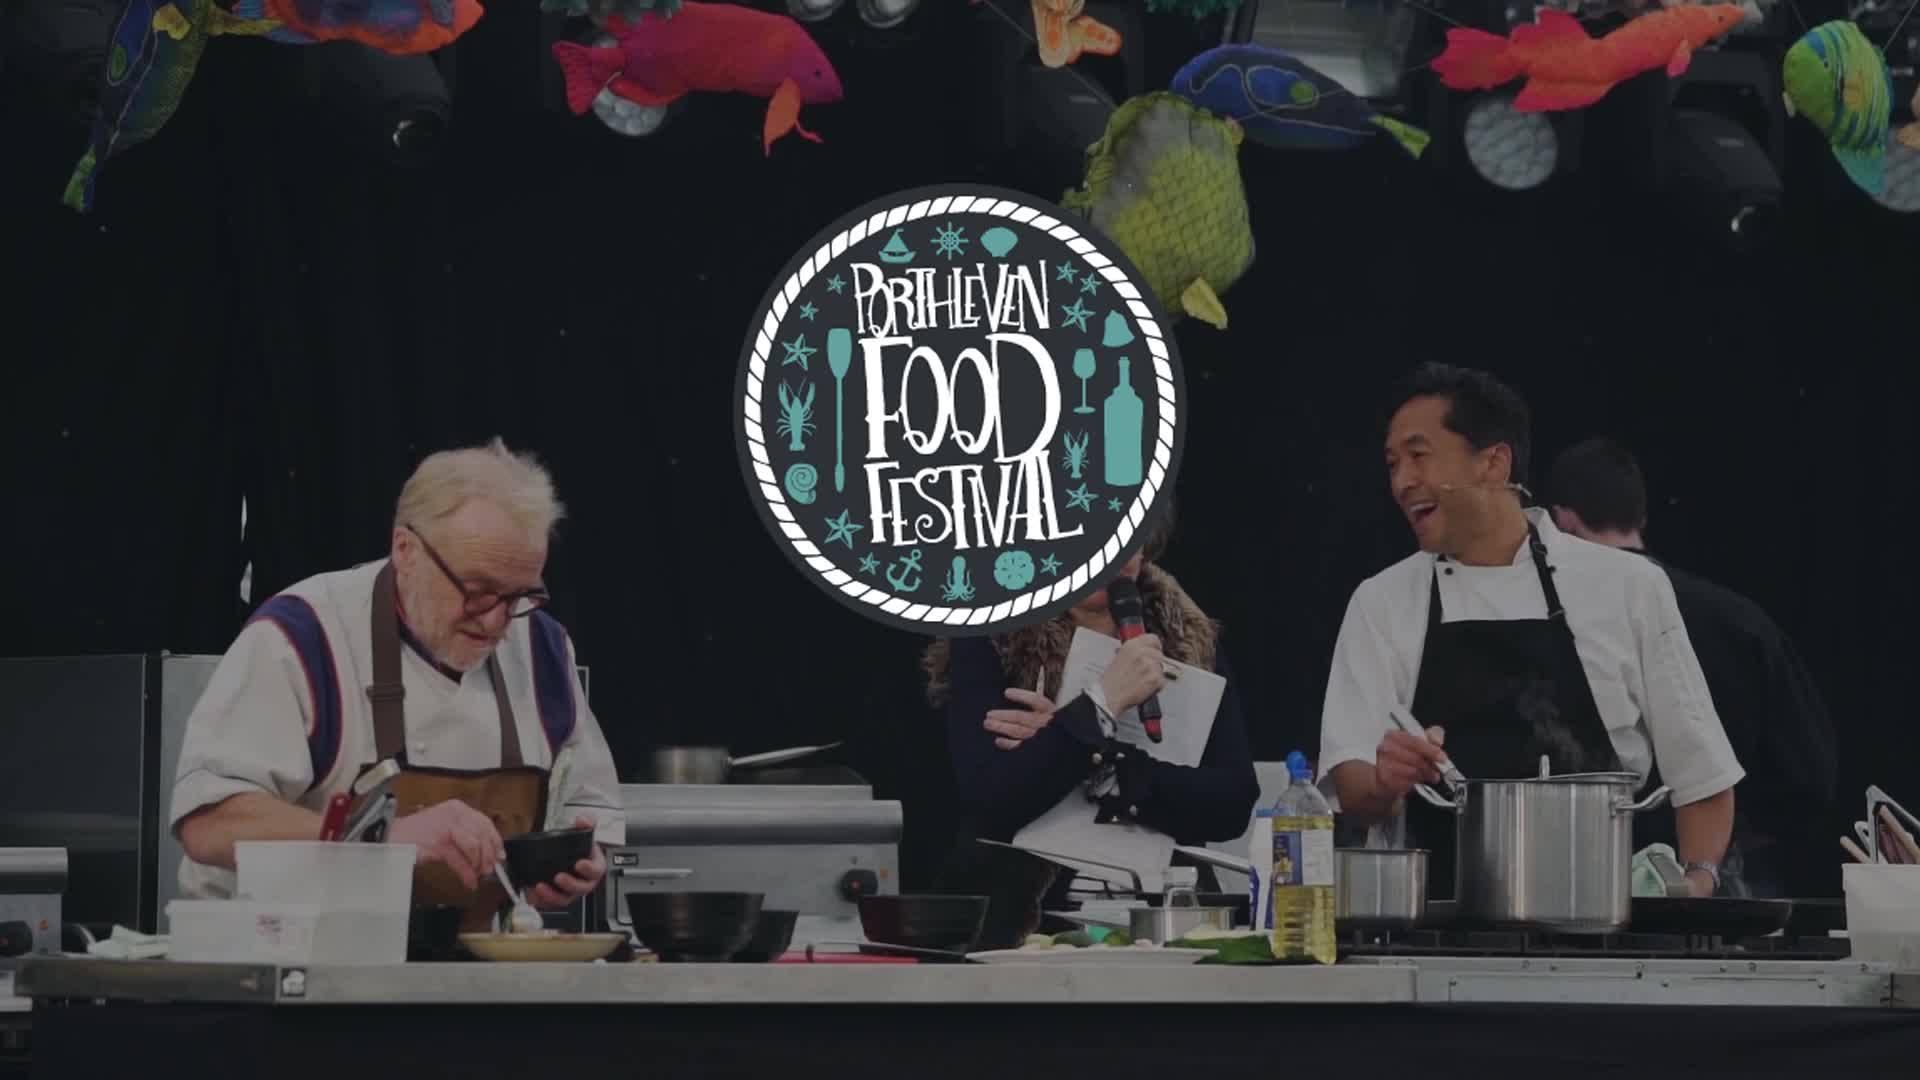 PORTHLEVEN FOOD FESTIVAL 2020